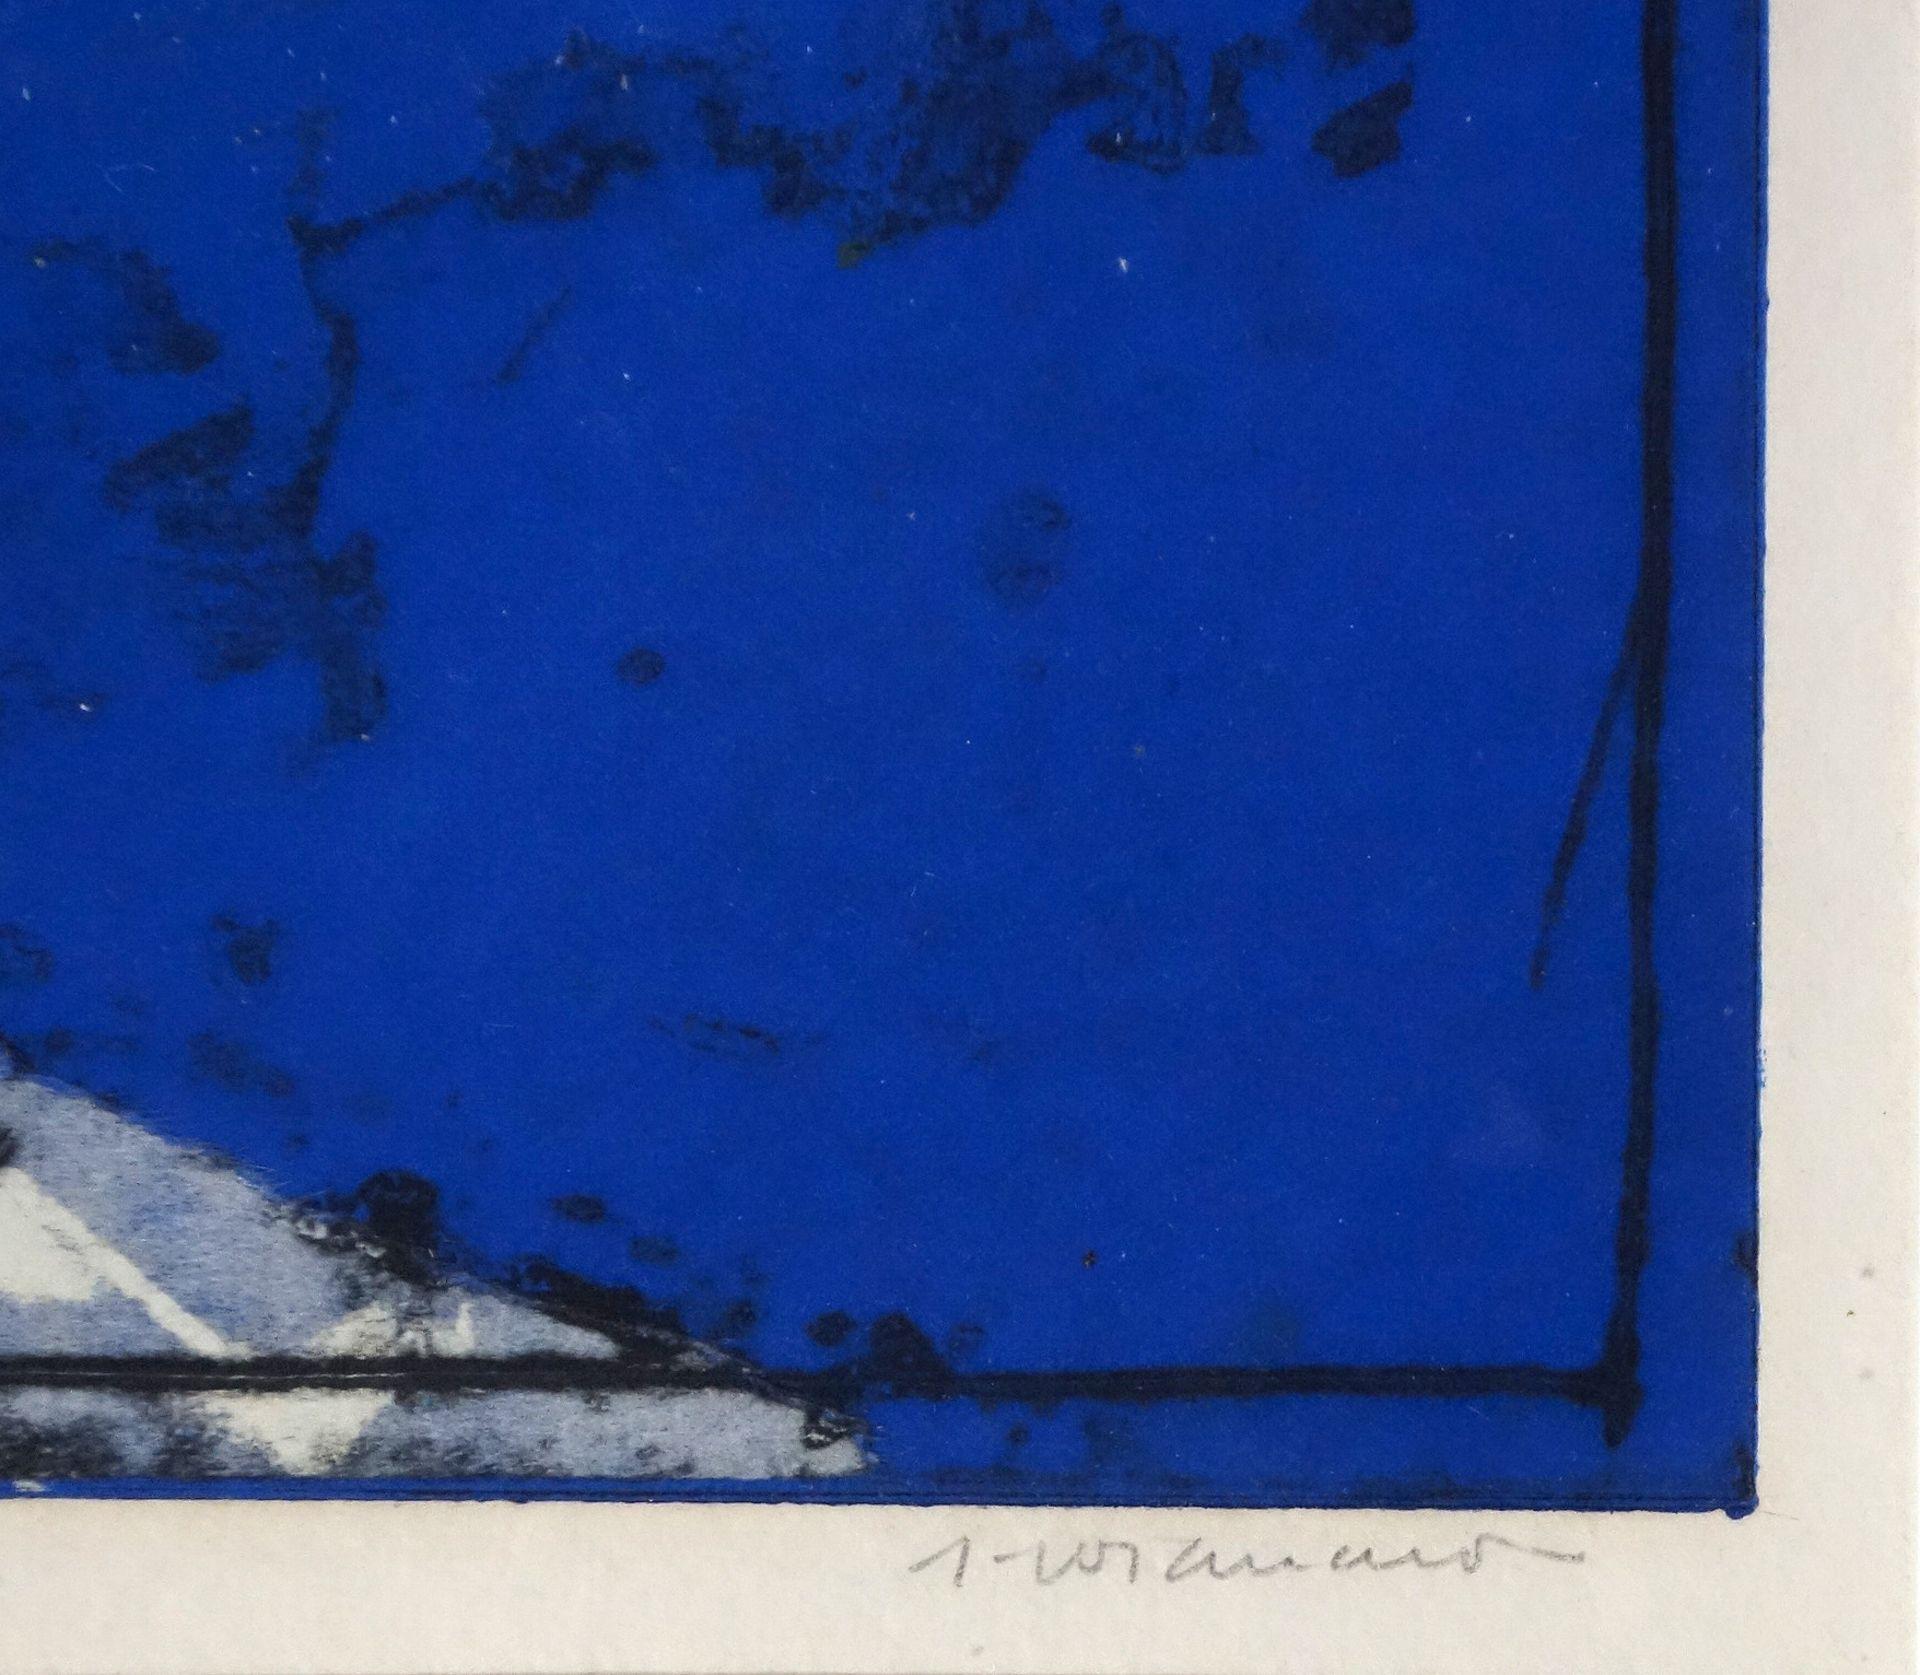 James Coignard (1925–2008) Inversement (1991) - Bild 2 aus 3